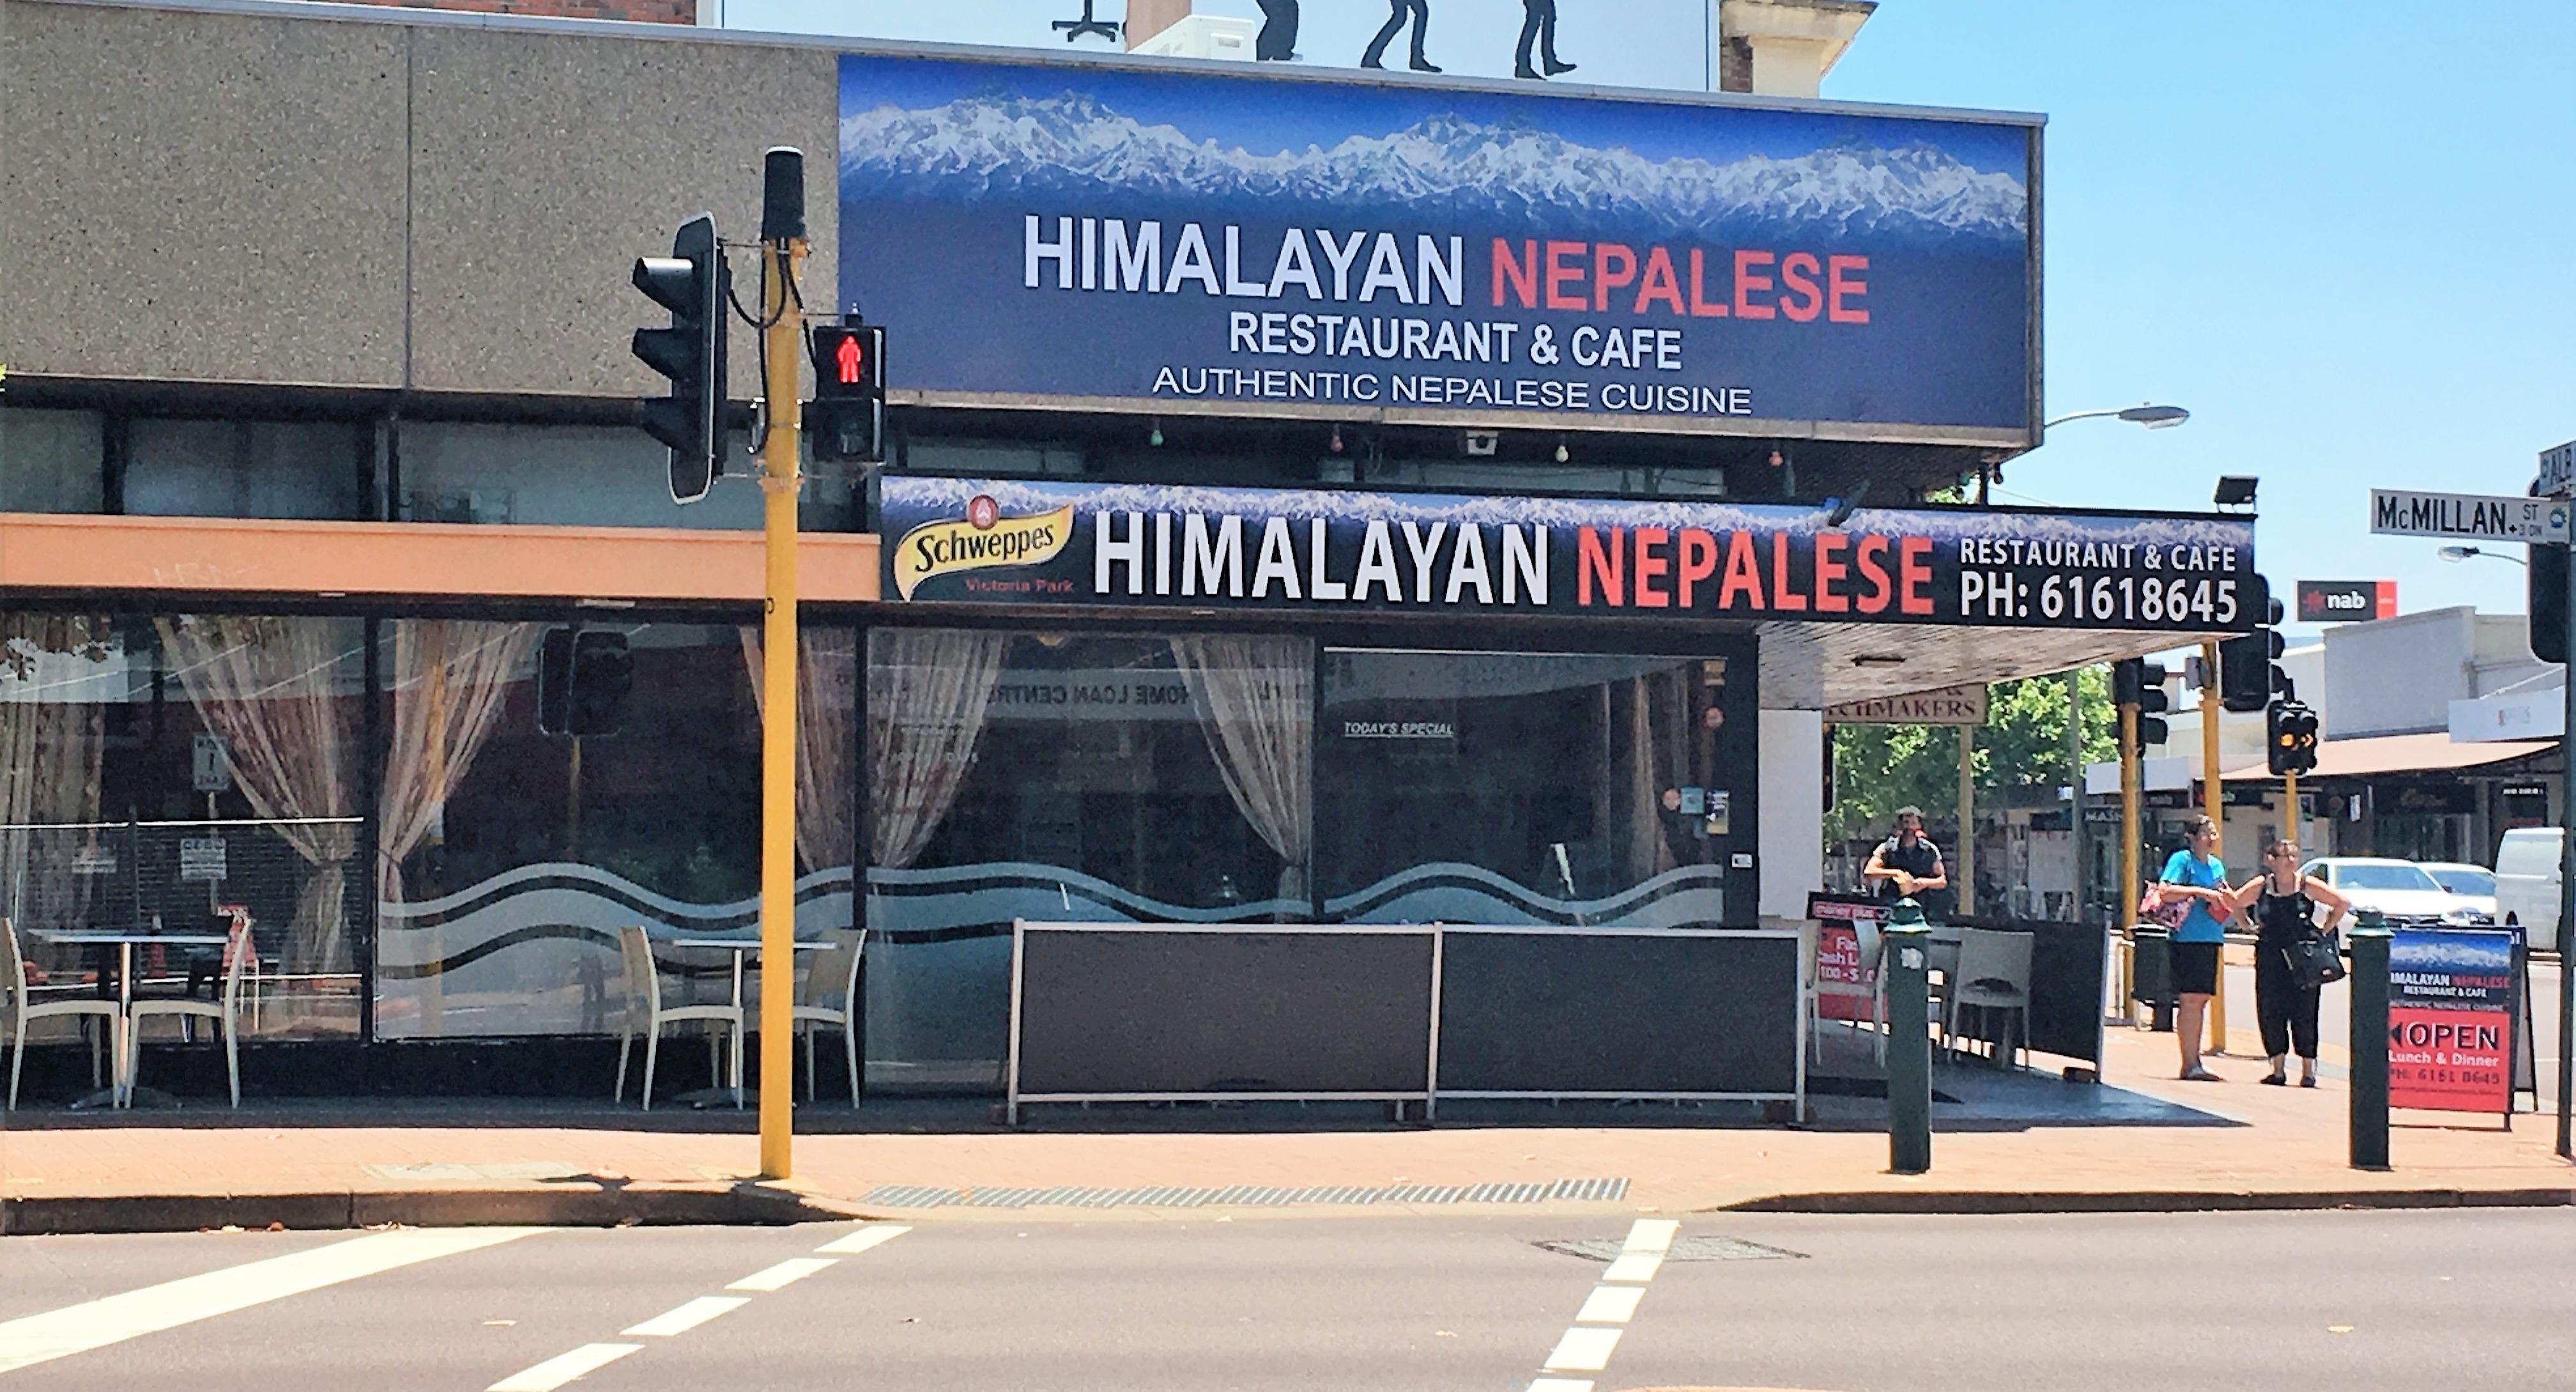 Himalayan Nepalese Restaurant - Victoria Park Perth image 1